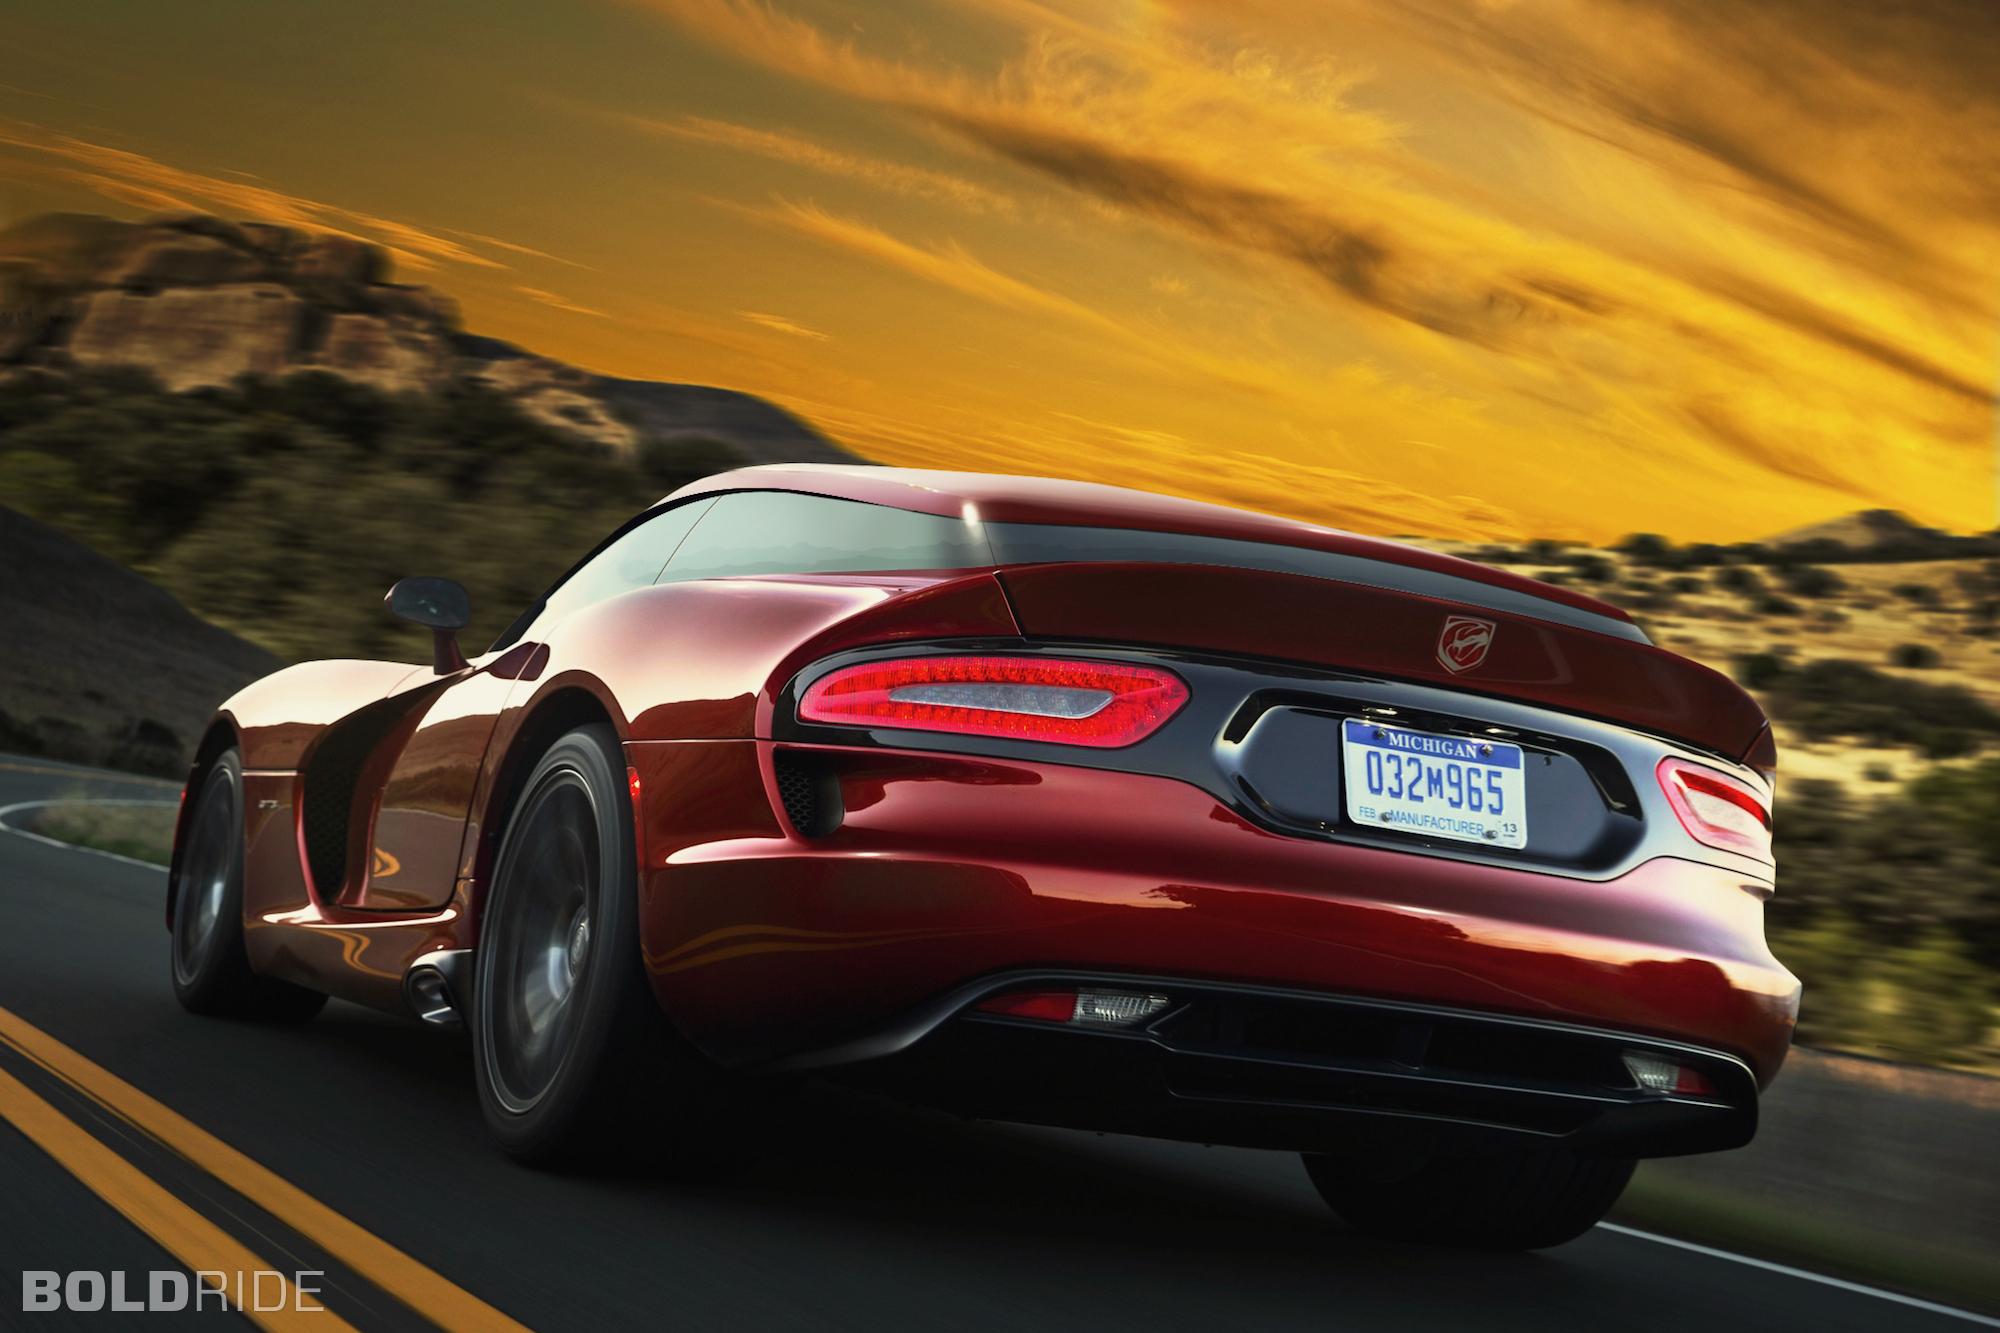 2015 SRT Viper Sportback 1280 x 1080